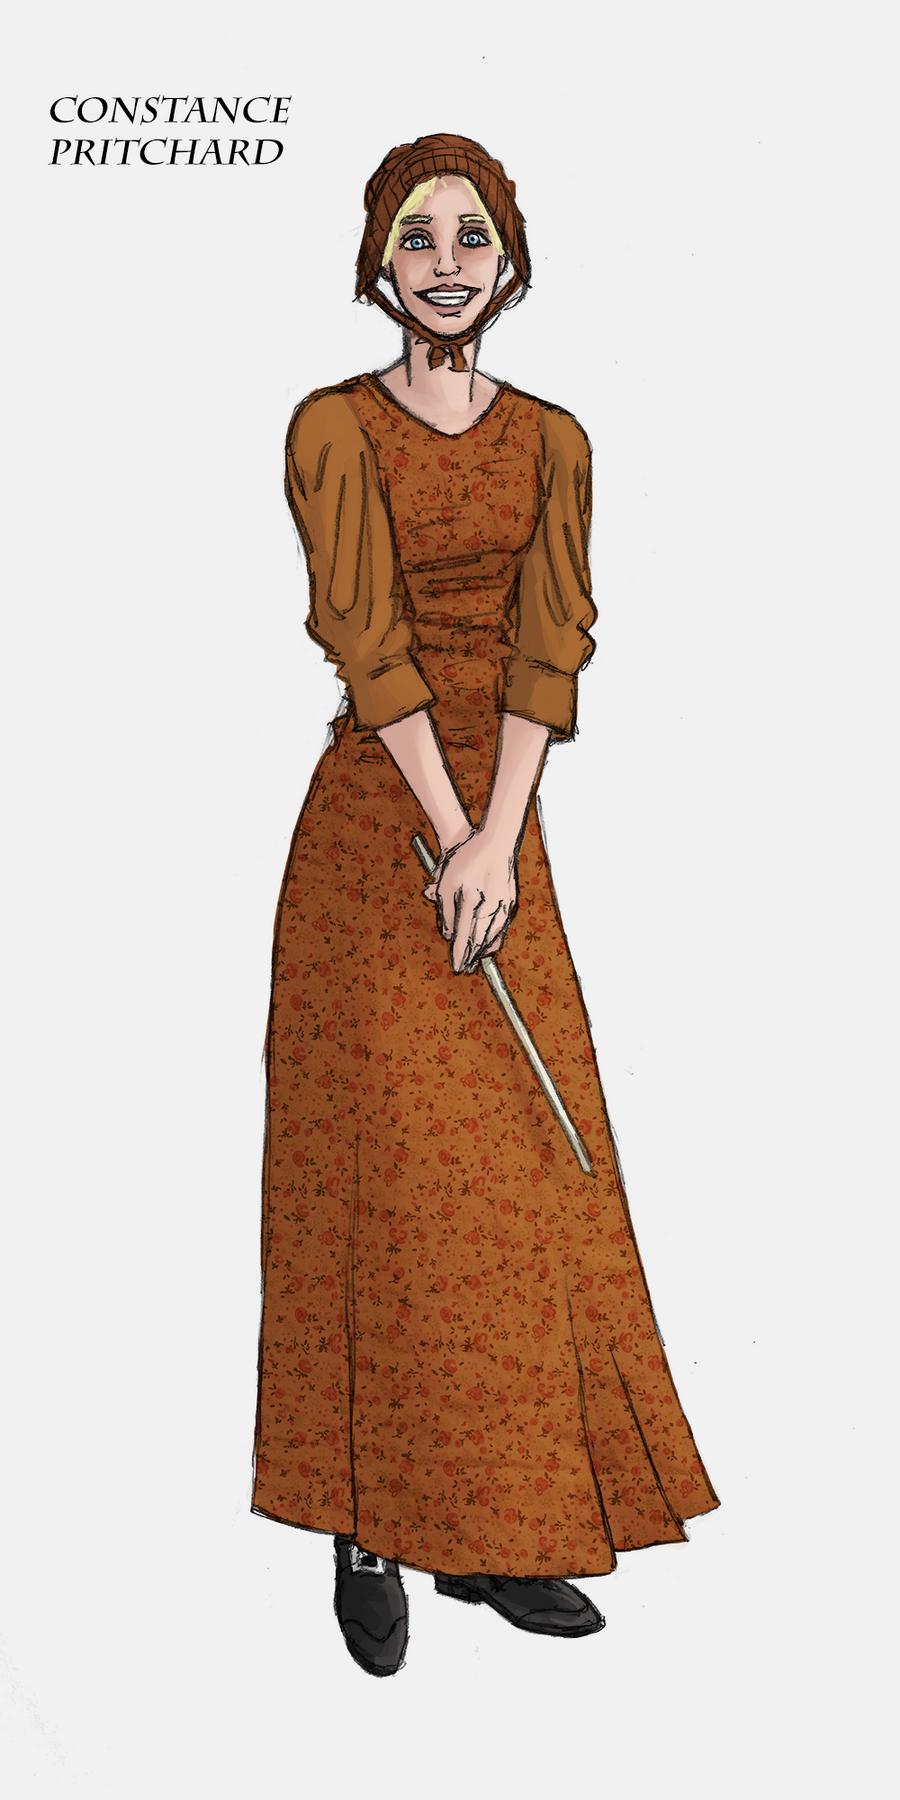 Constance Pritchard